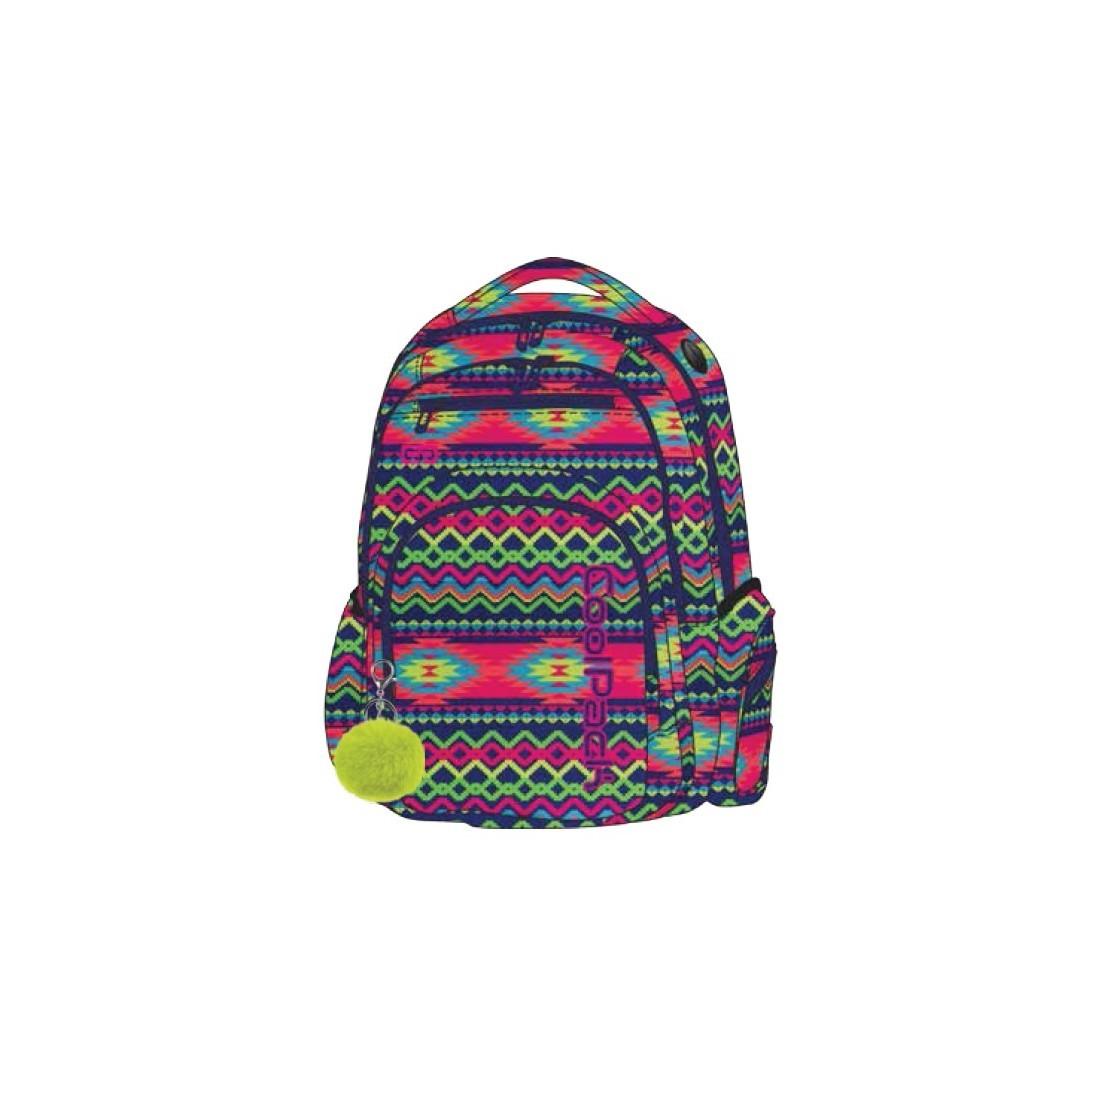 96e0d610861b2 Plecak szkolny CoolPack CP FLASH BOHO ELECTRA elektryczny dla nastolatki -  A473